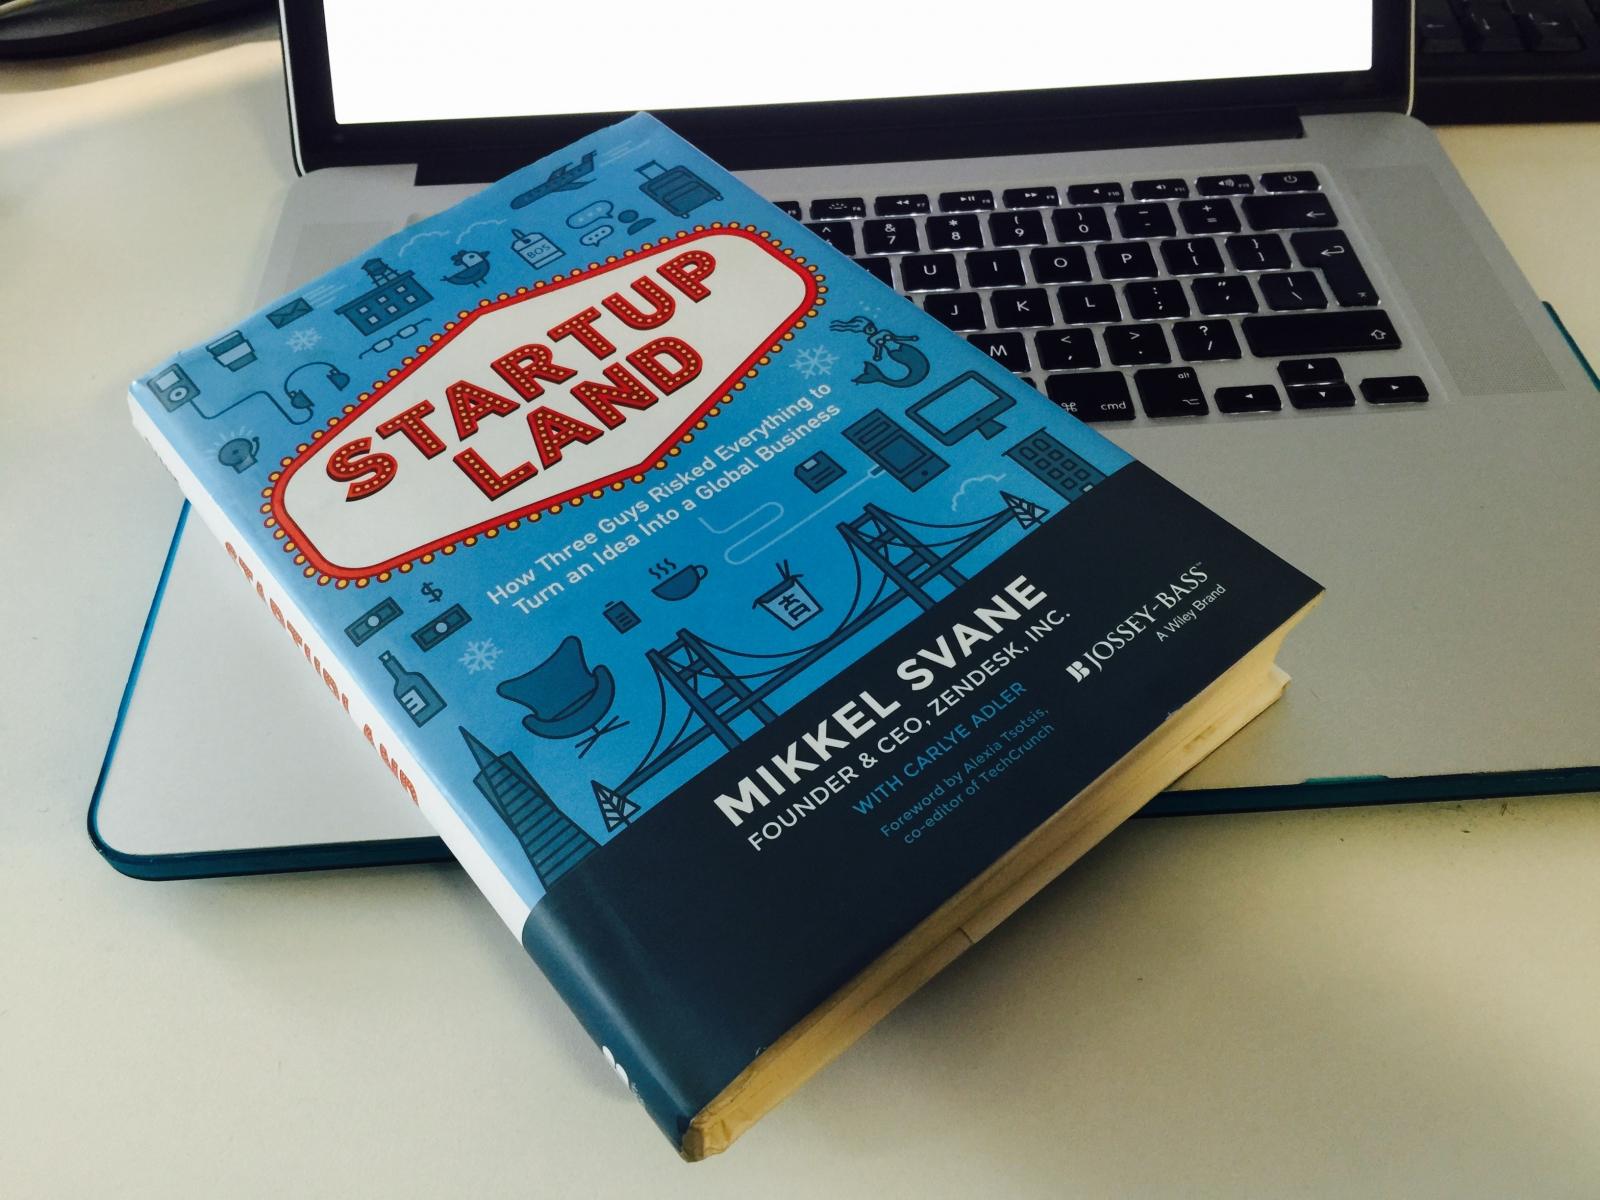 Startupland Review - Mikkel Svane's account of growing Zendesk